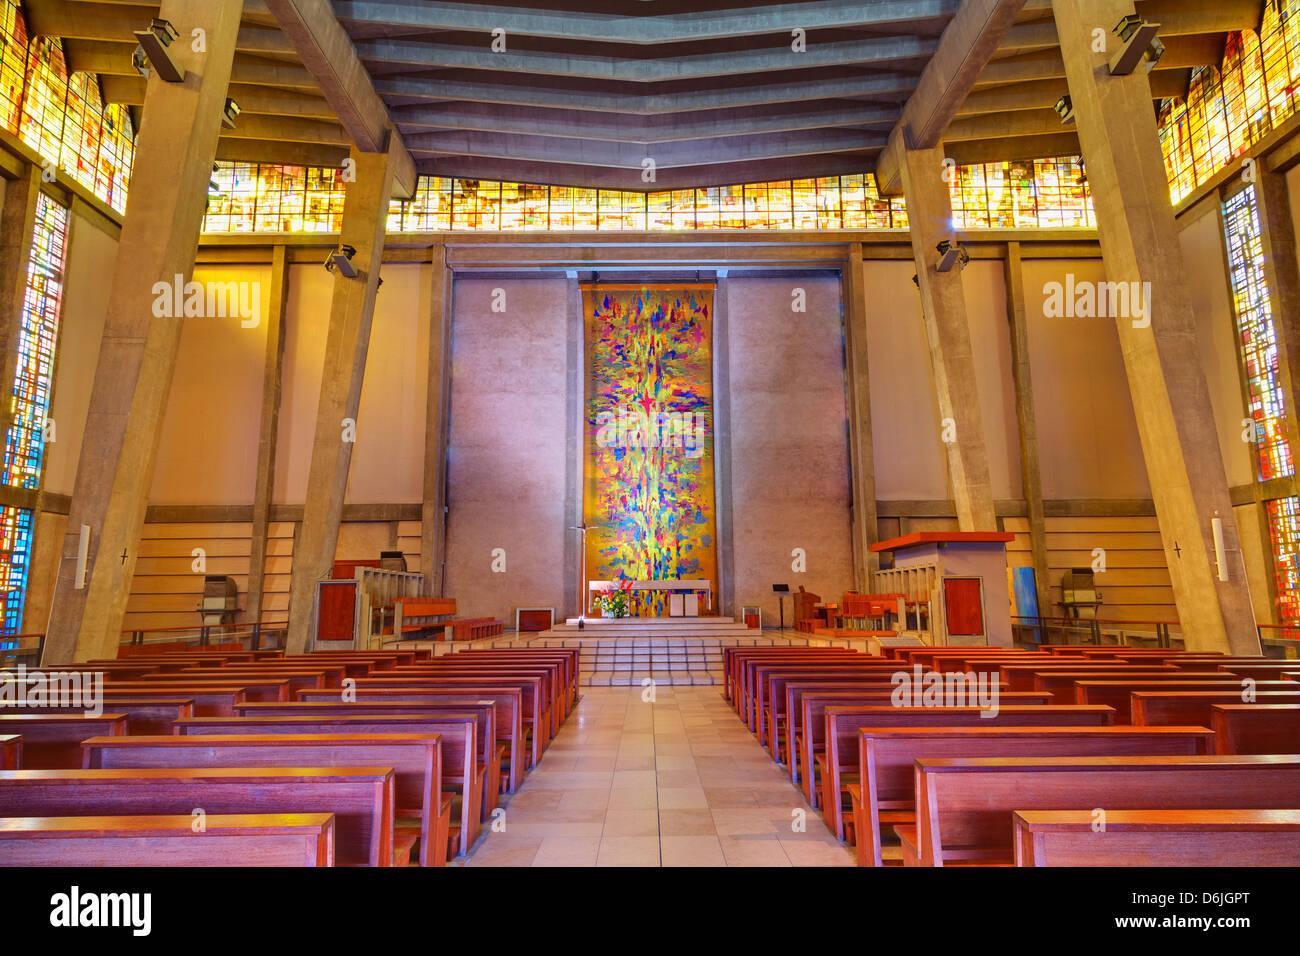 Saint Michel du Havre Church, Le Havre, Normandy, France, Europe - Stock Image